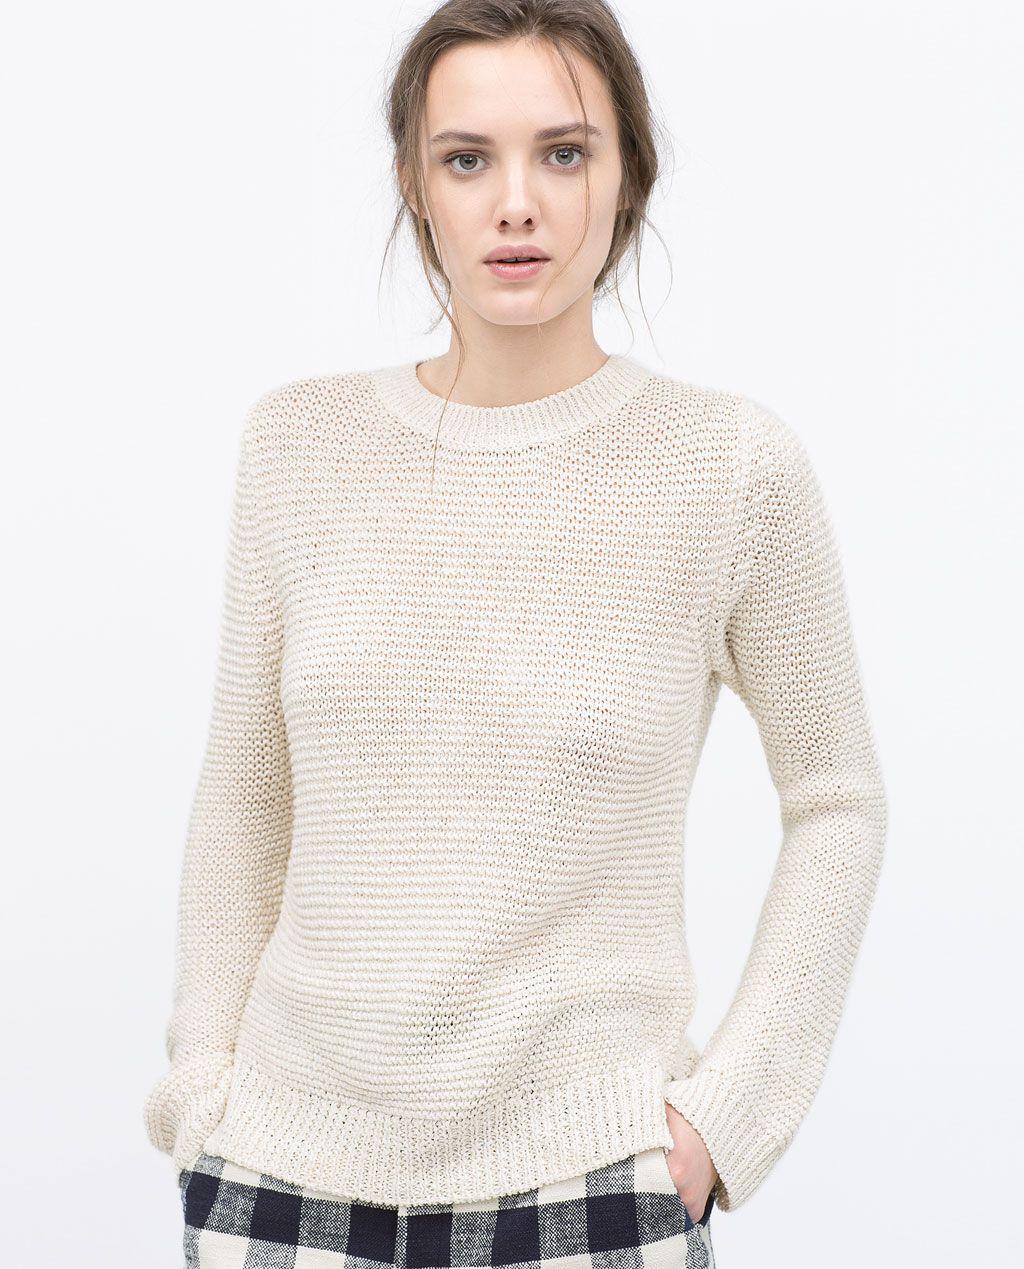 LINK KNIT SWEATER-Knitwear-WOMAN-SALE | ZARA United States | Zara ...